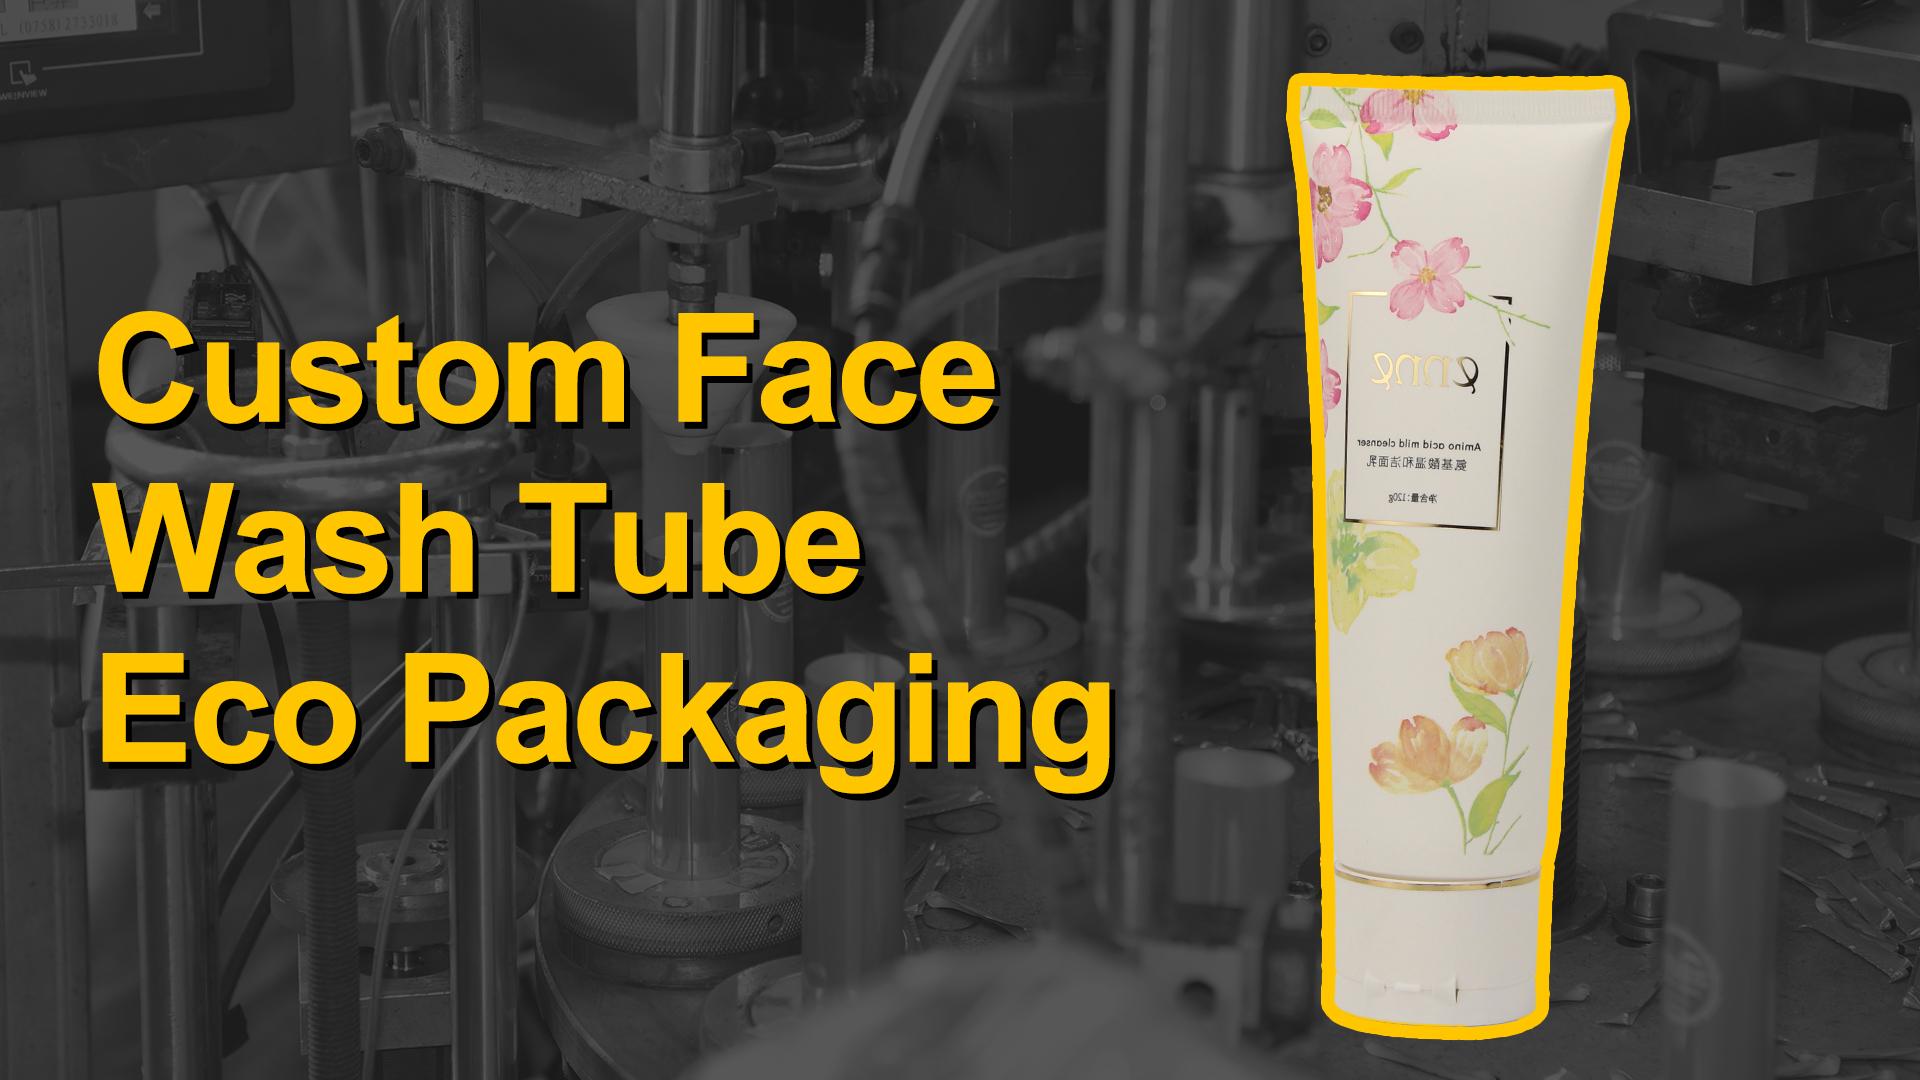 D40MM مخصص الوجه غسل أنبوب التعبئة والتغليف البيئية